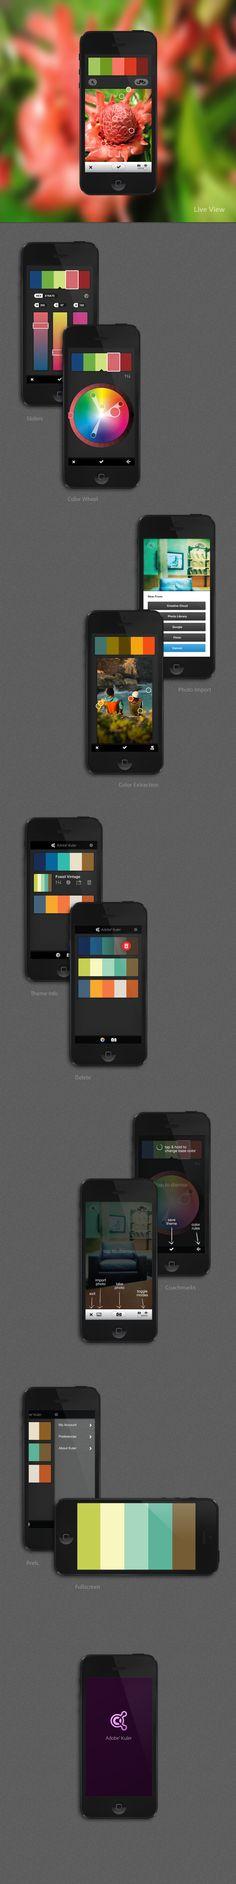 Adobe Kuler (iPhone app) by Gabriel Campbell, via Behance